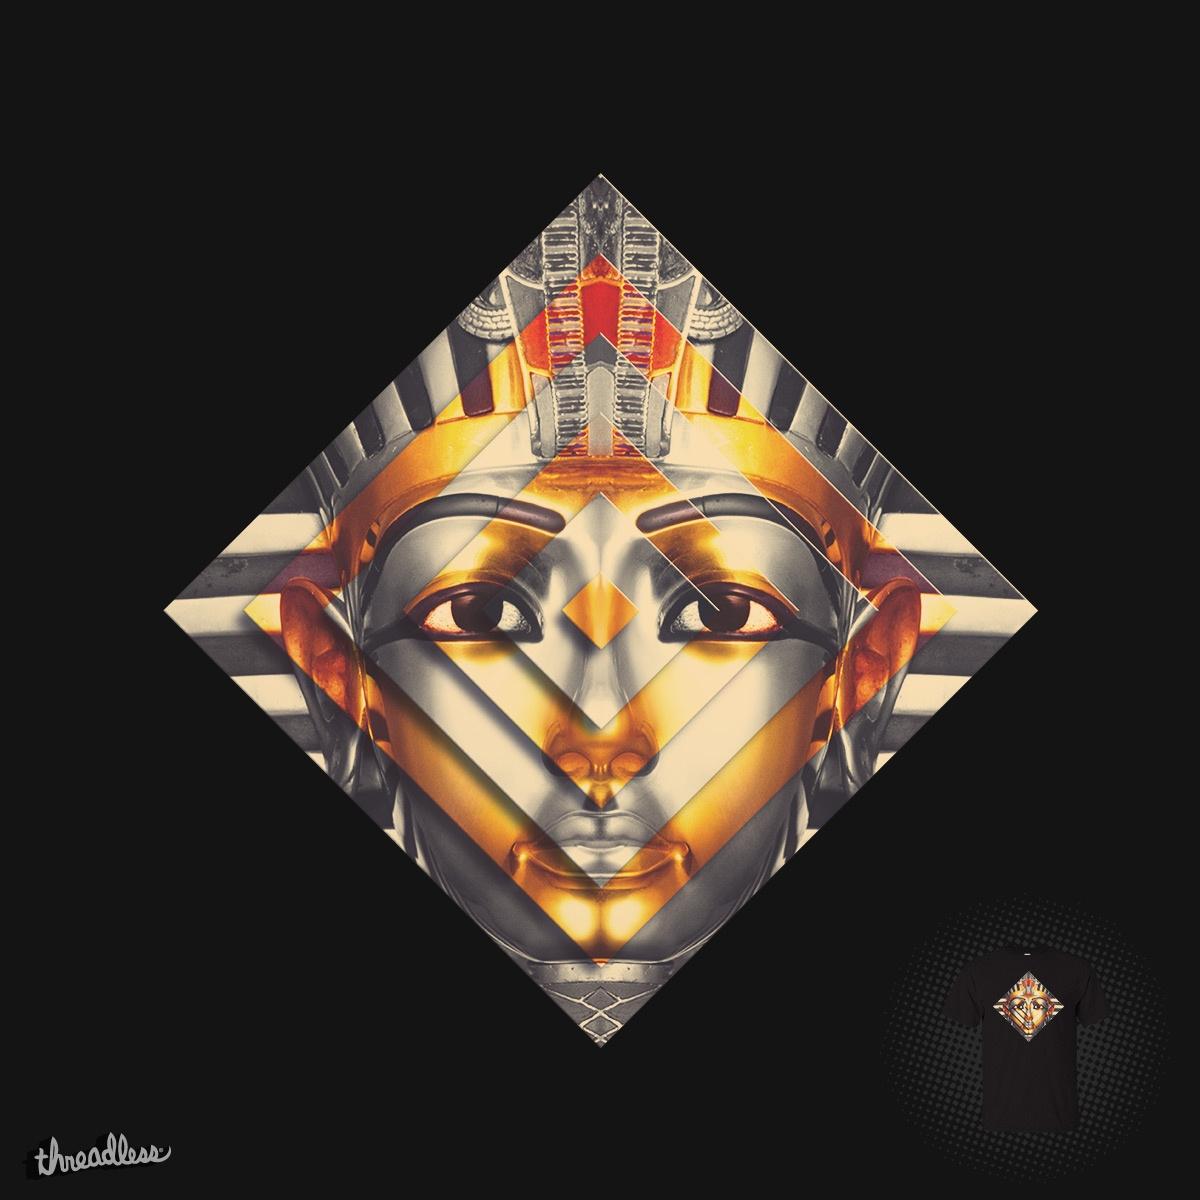 Pyramid by BrunoFavre on Threadless